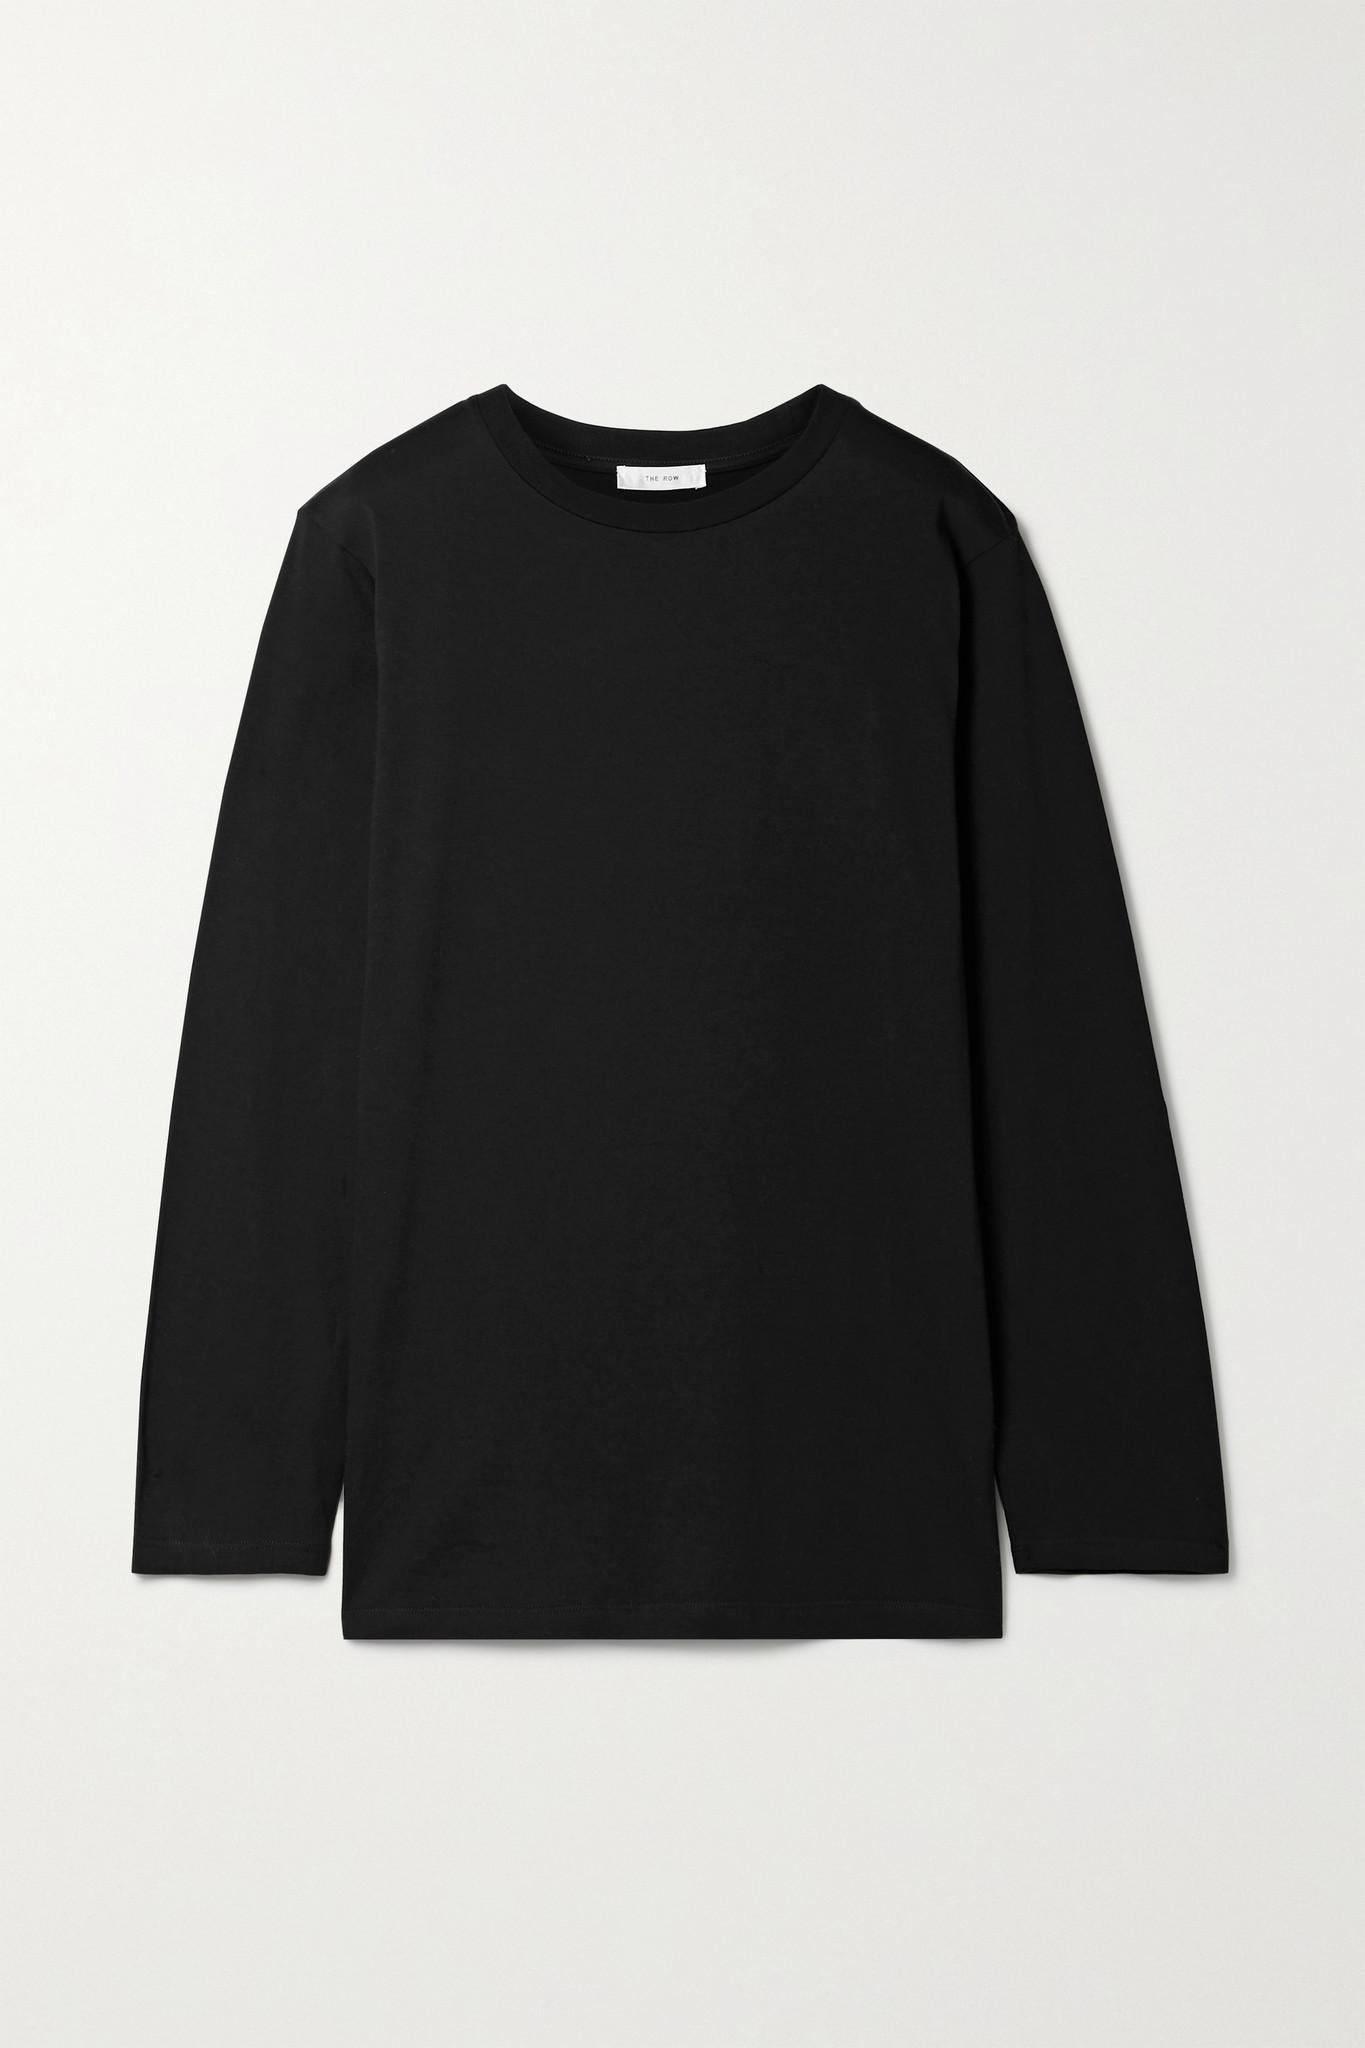 THE ROW - Autie Cotton-jersey Top - Black - medium